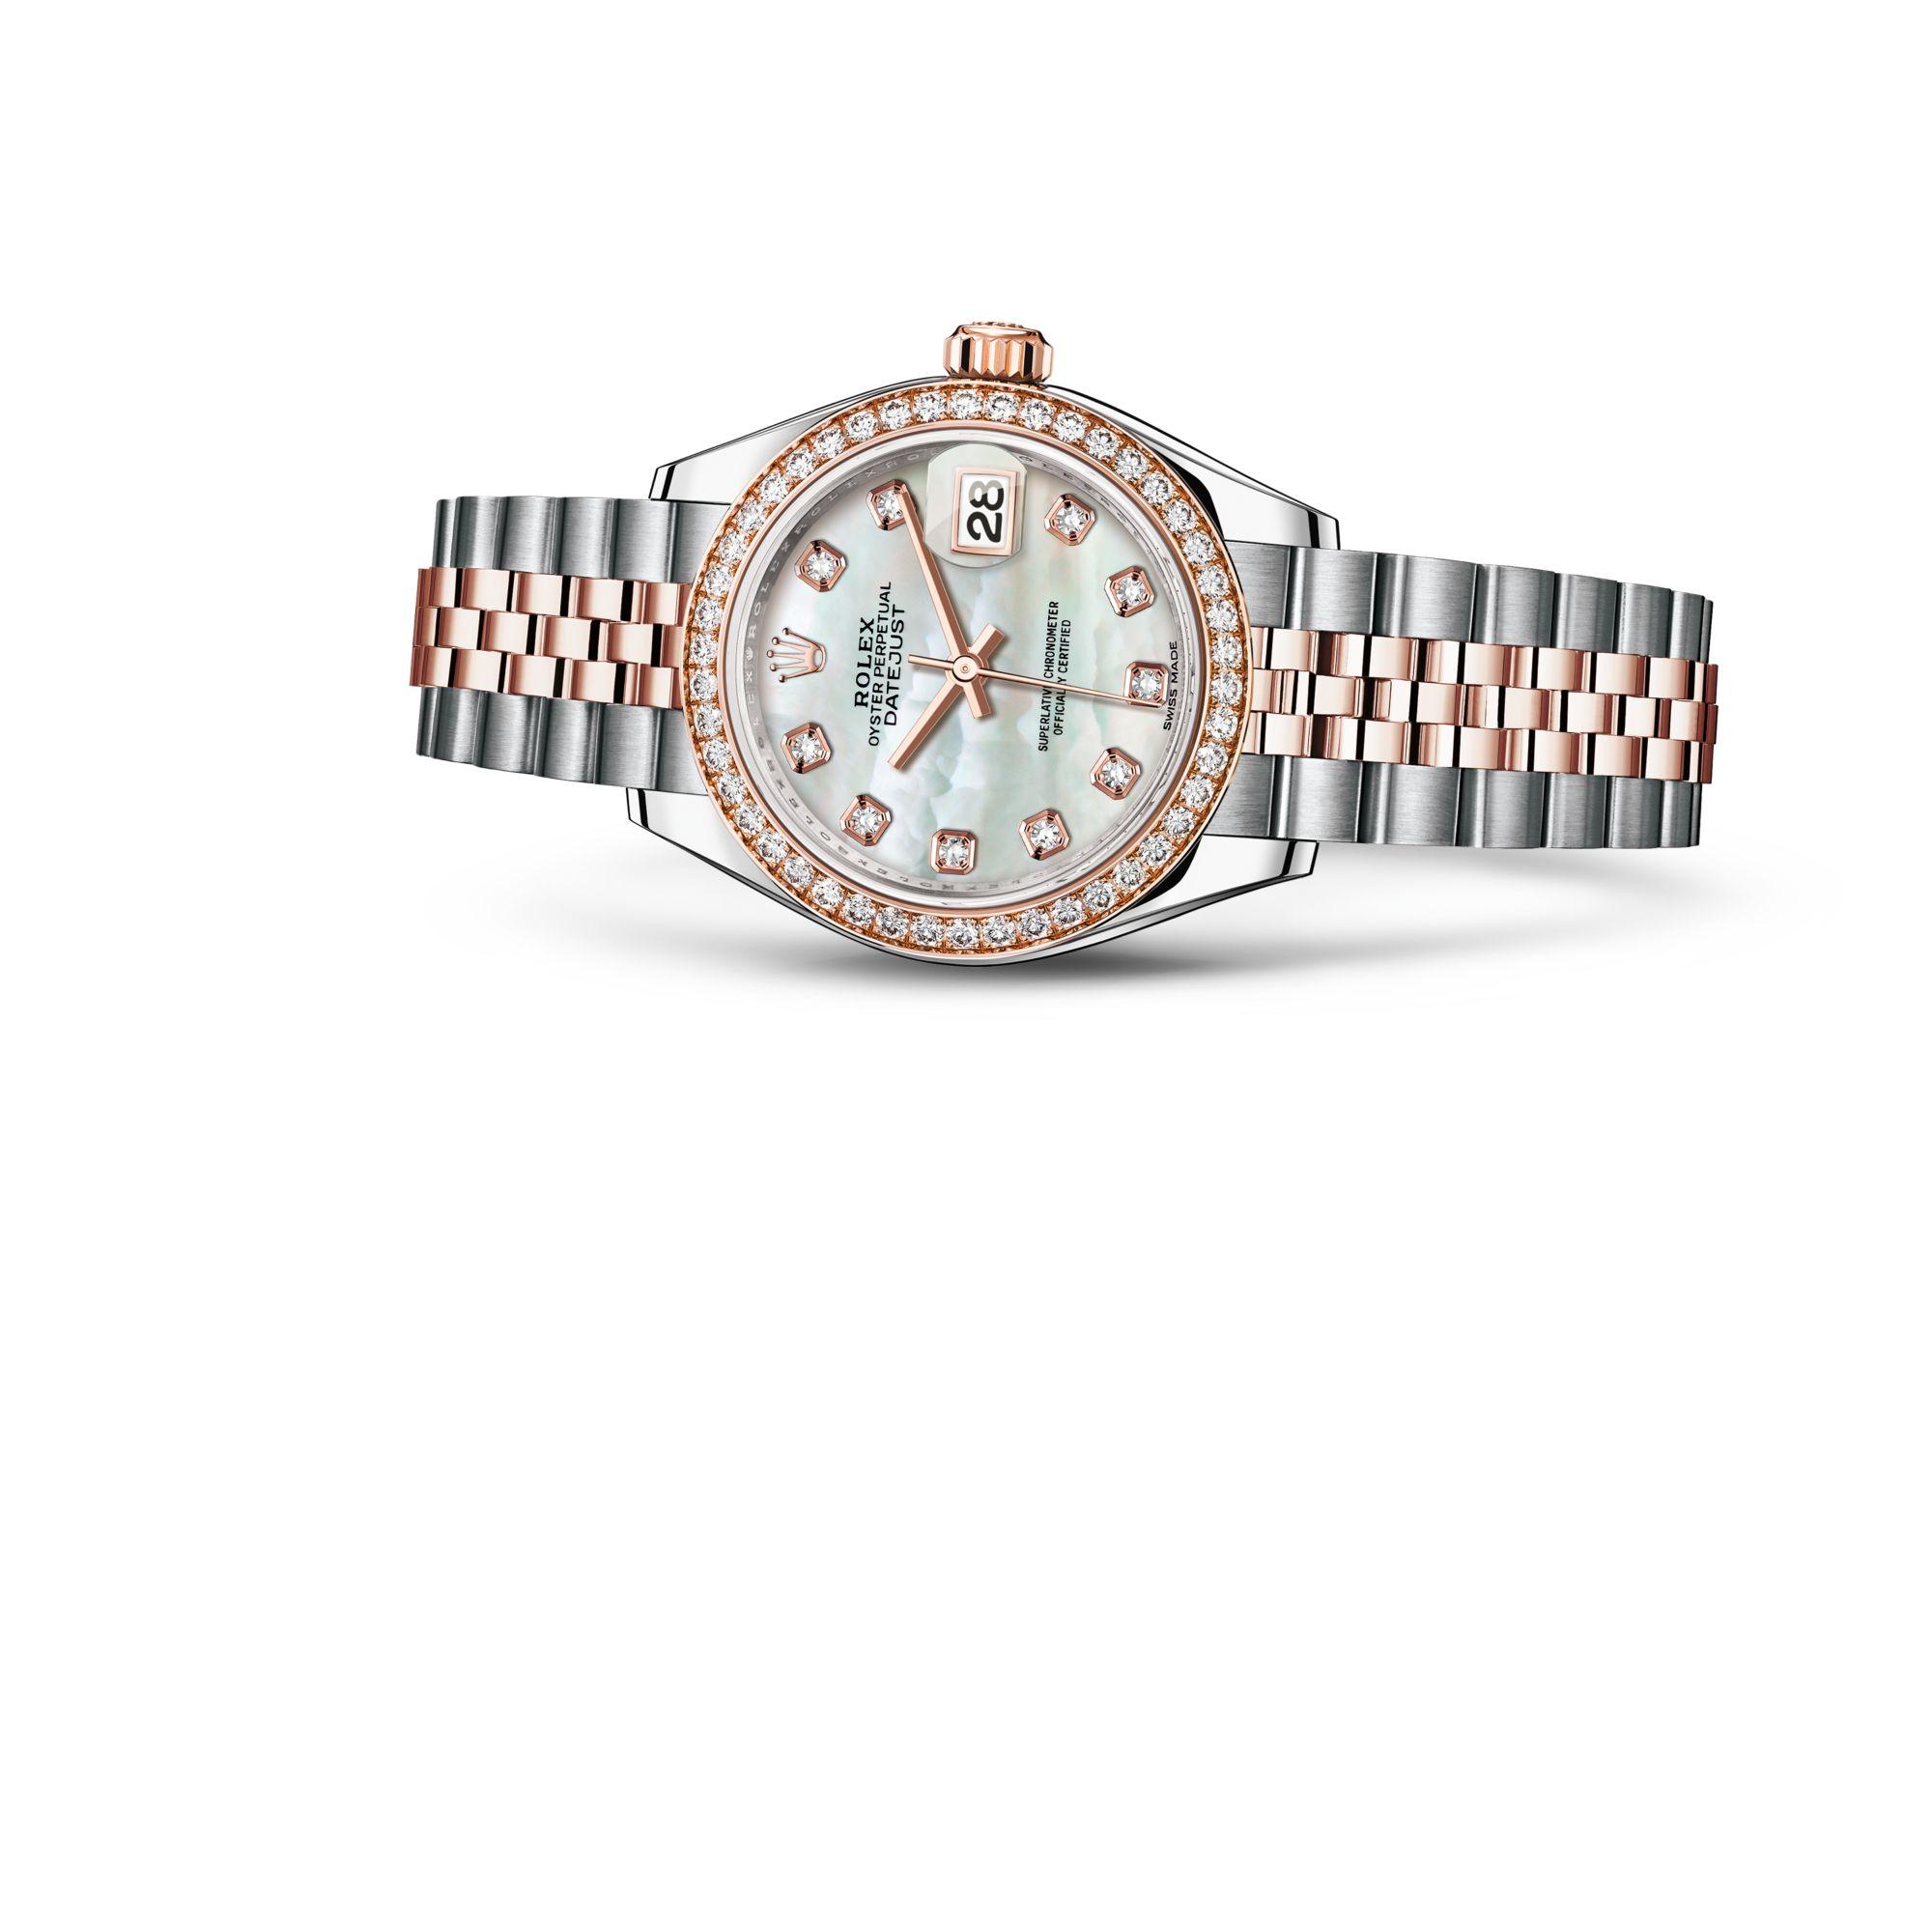 Rolex ليدي ديت جست ٢٨ M279381RBR-0013